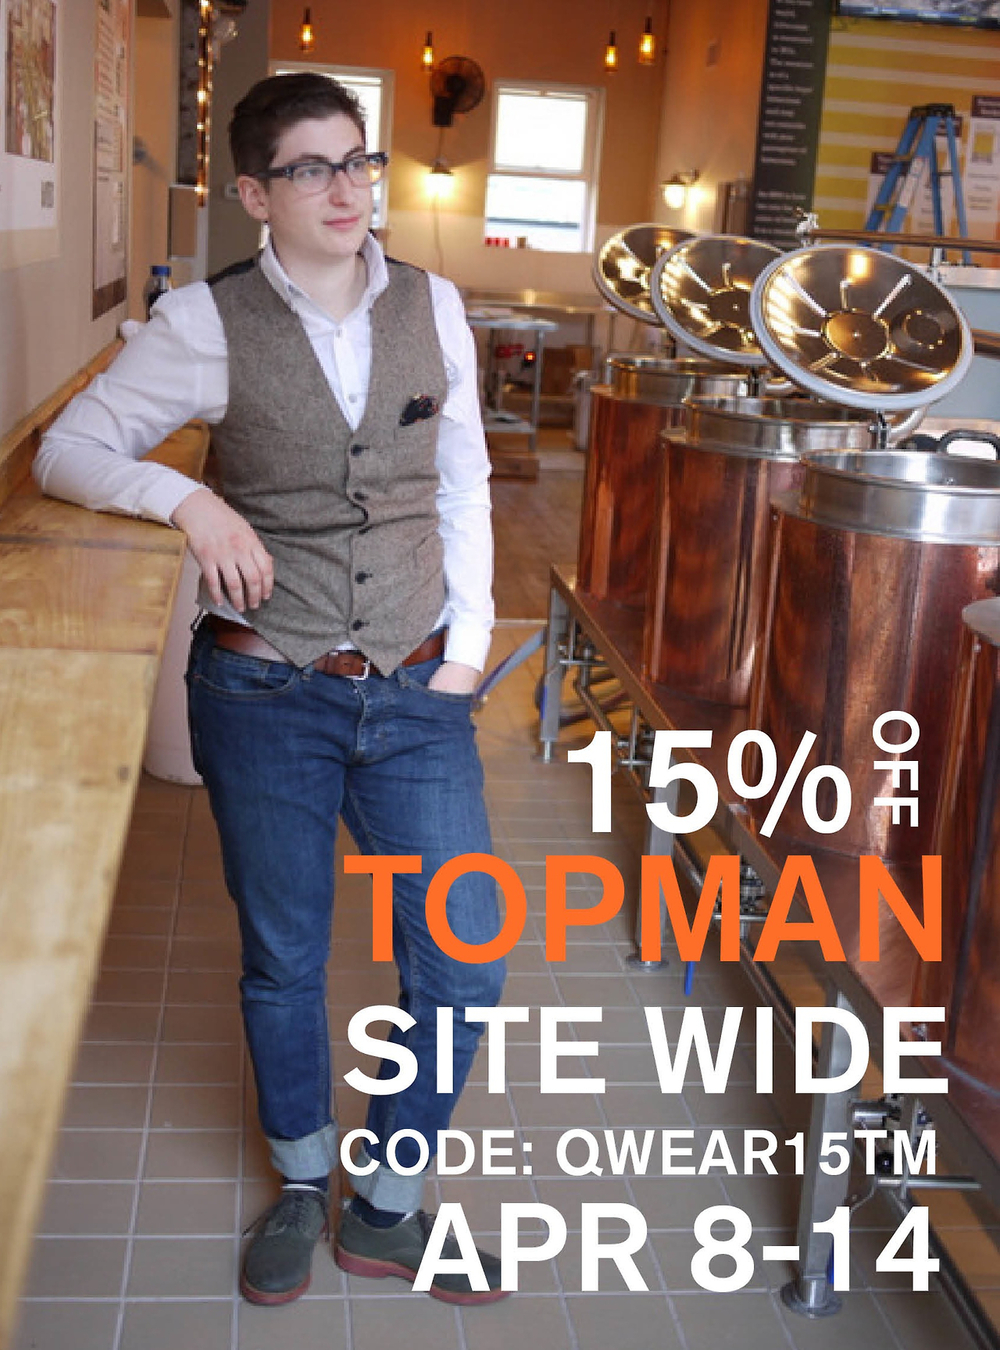 Qwear/Topman Sale